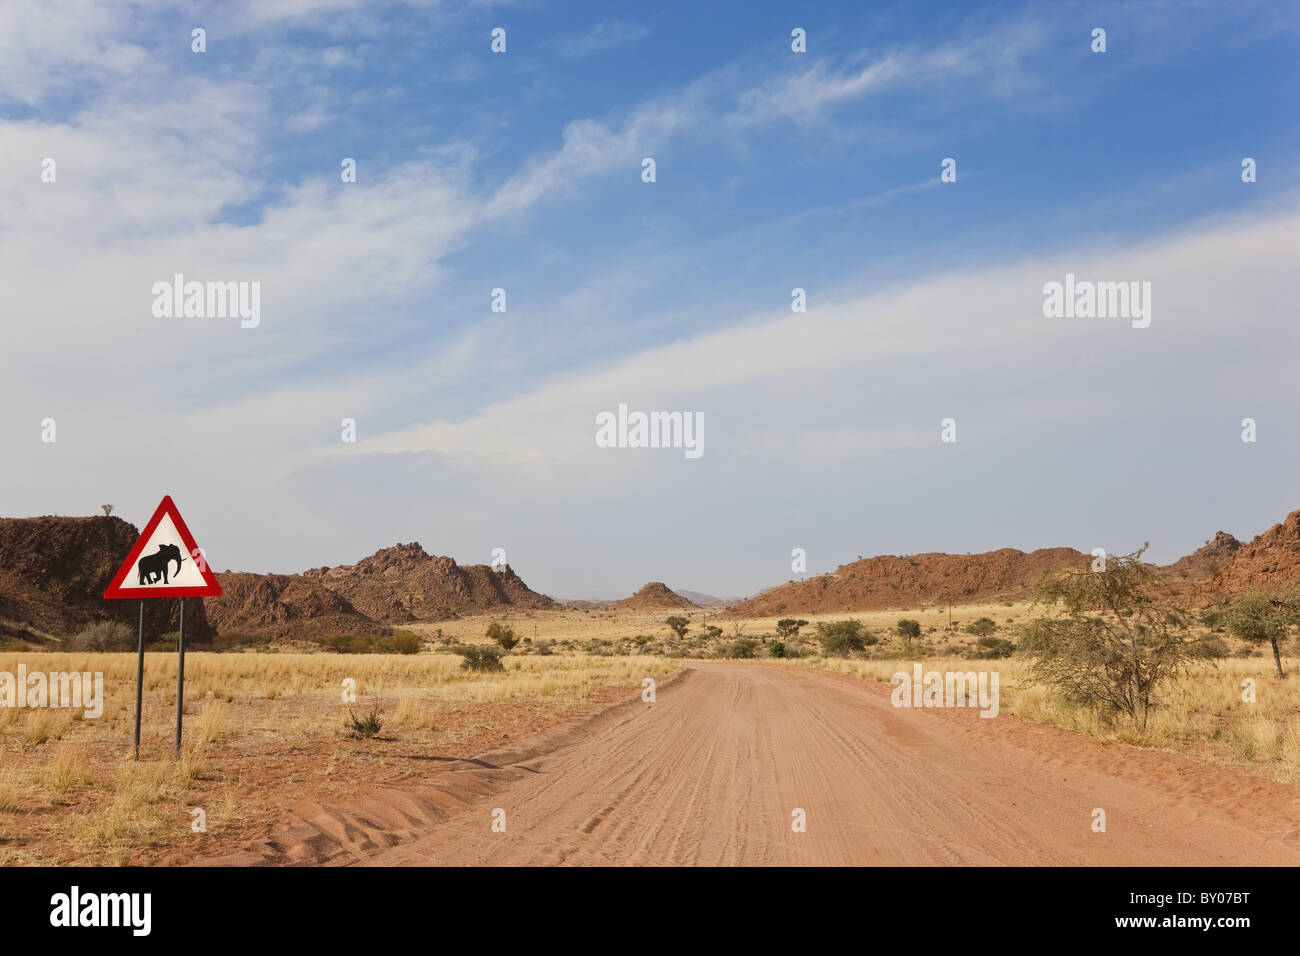 Señal de carretera de elefante & road, Damaraland, Namibia Imagen De Stock